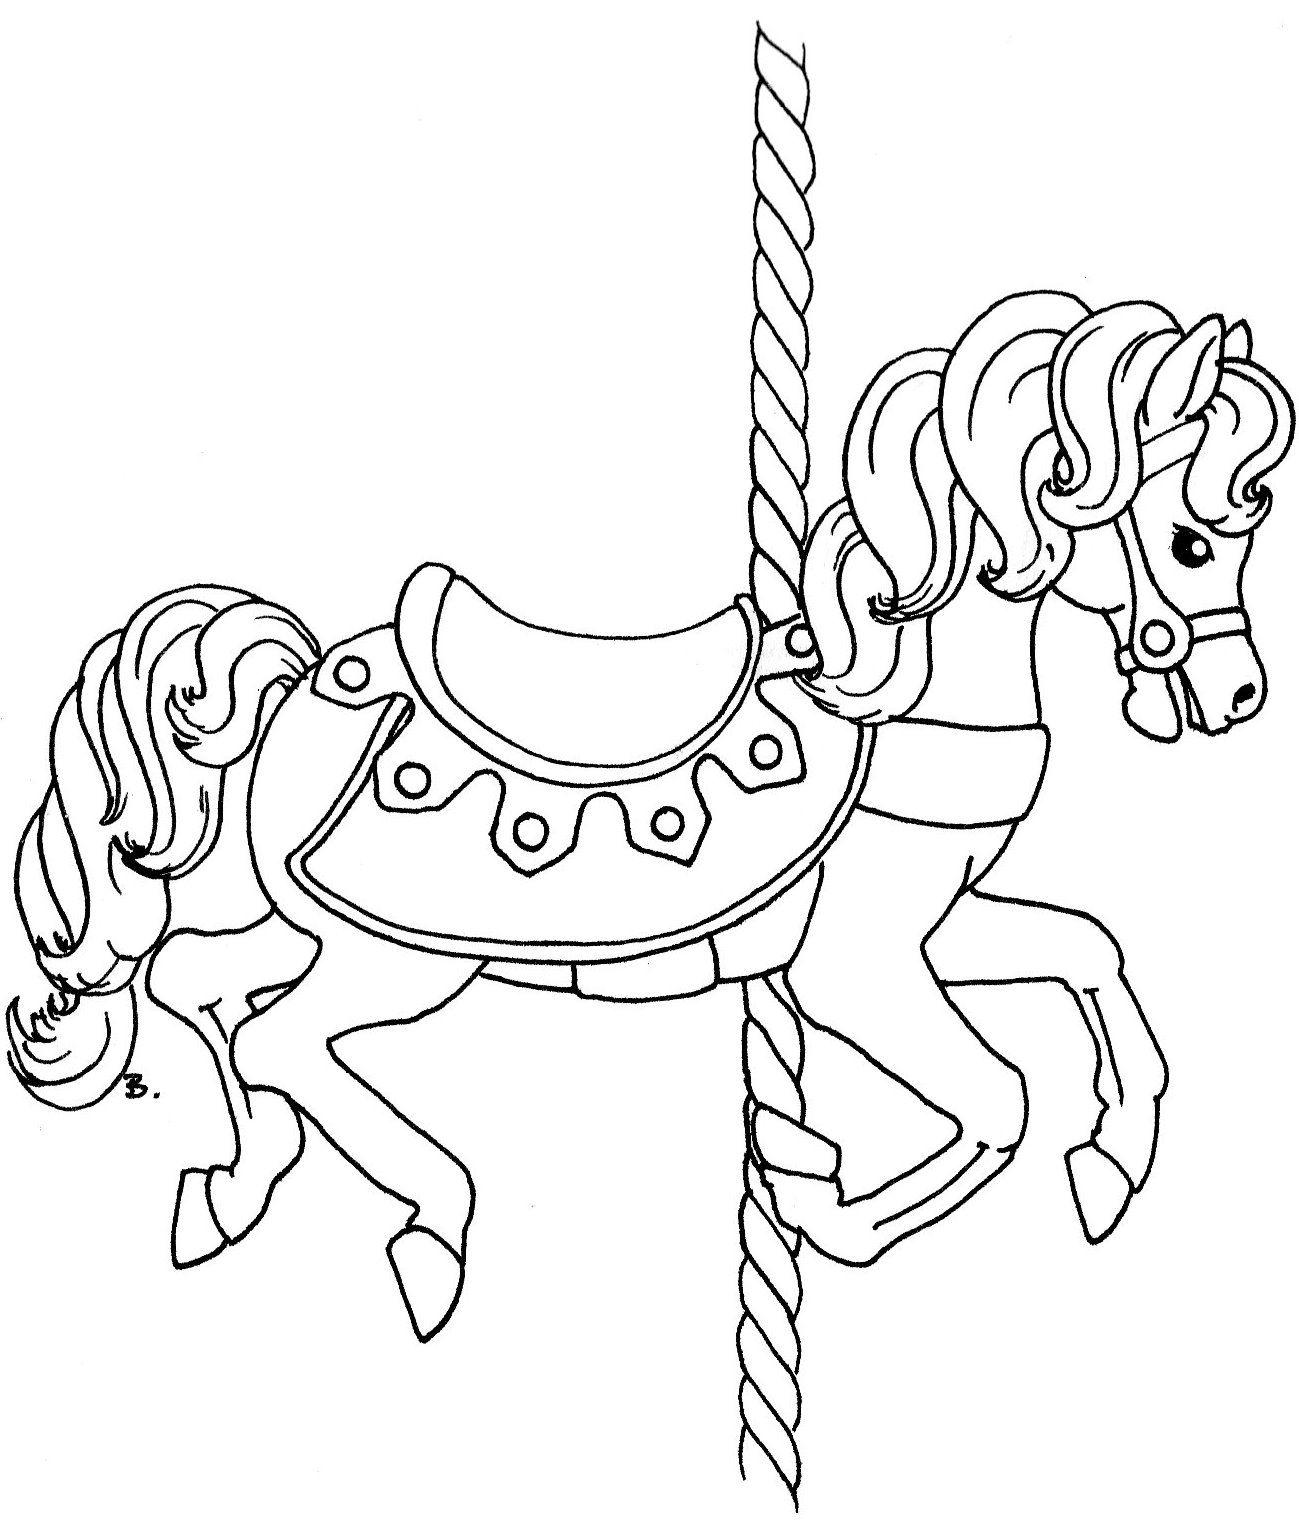 Carousel Horse | tatoo | Pinterest | Carrusel, Colorear y Molde